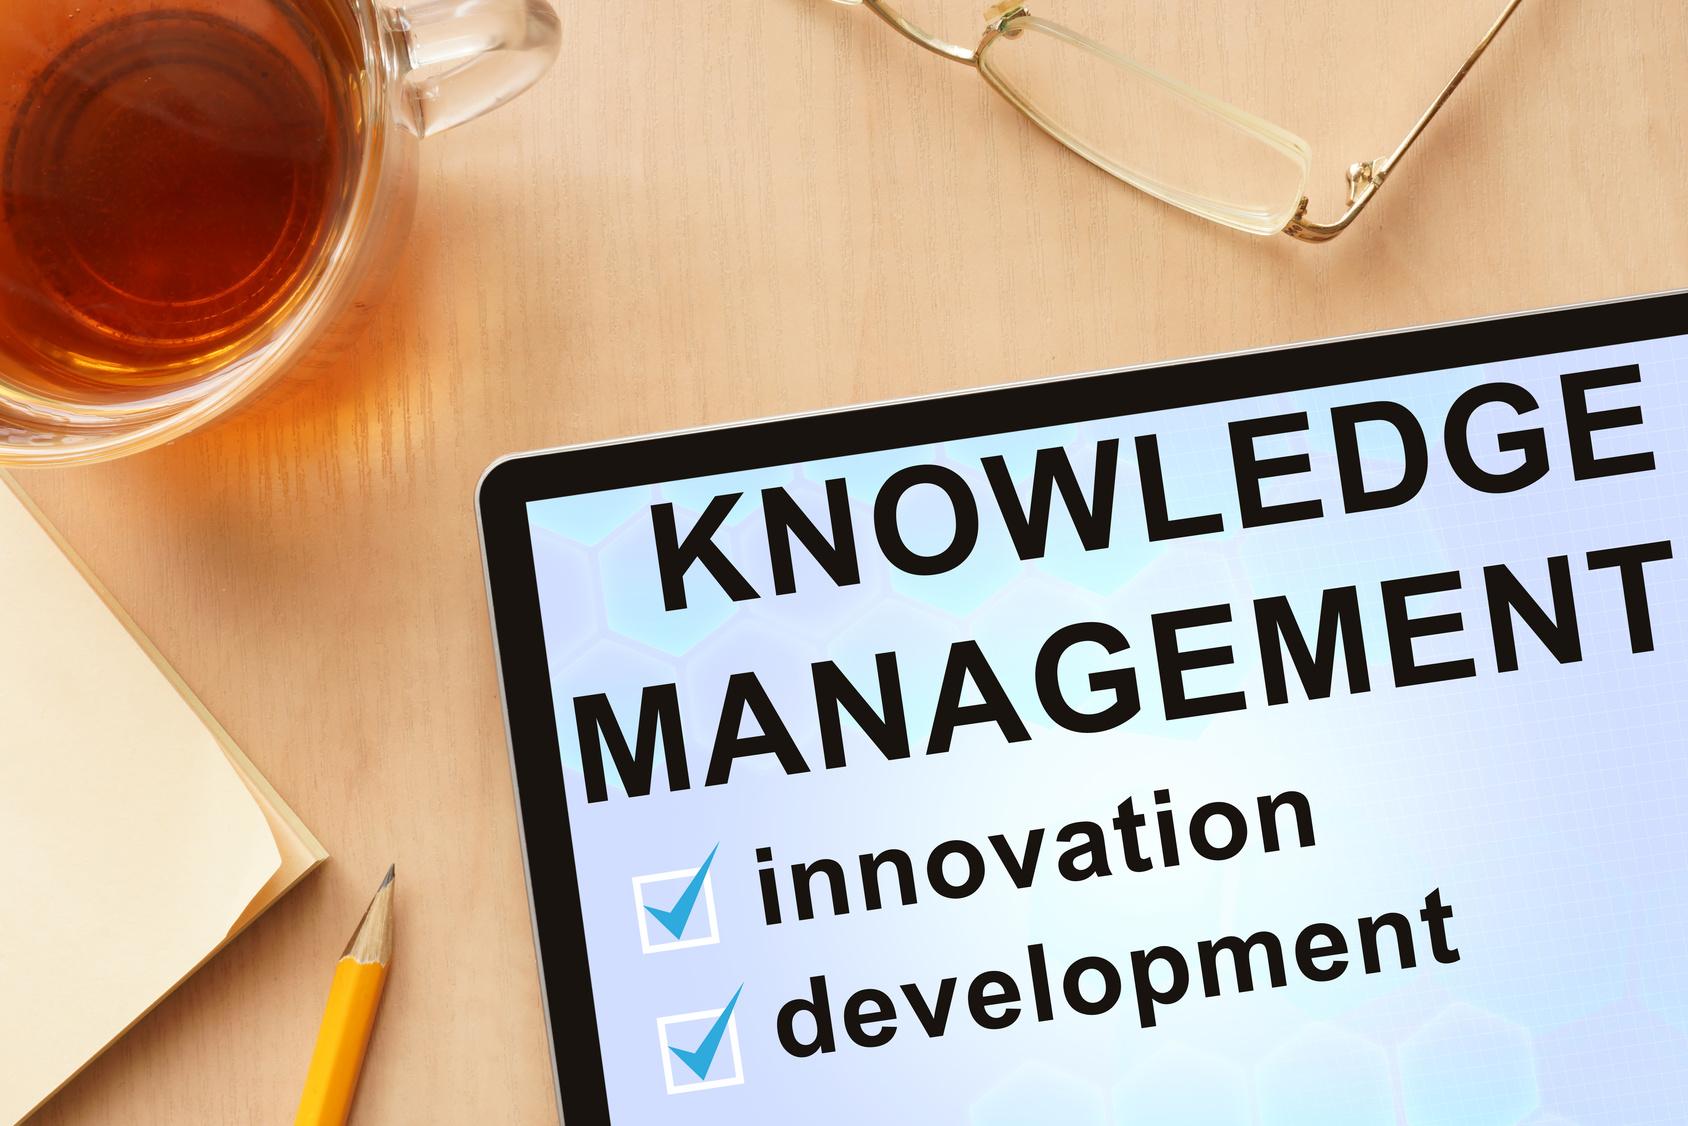 Knowledge Management im Service(© designer491 - Fotolia)